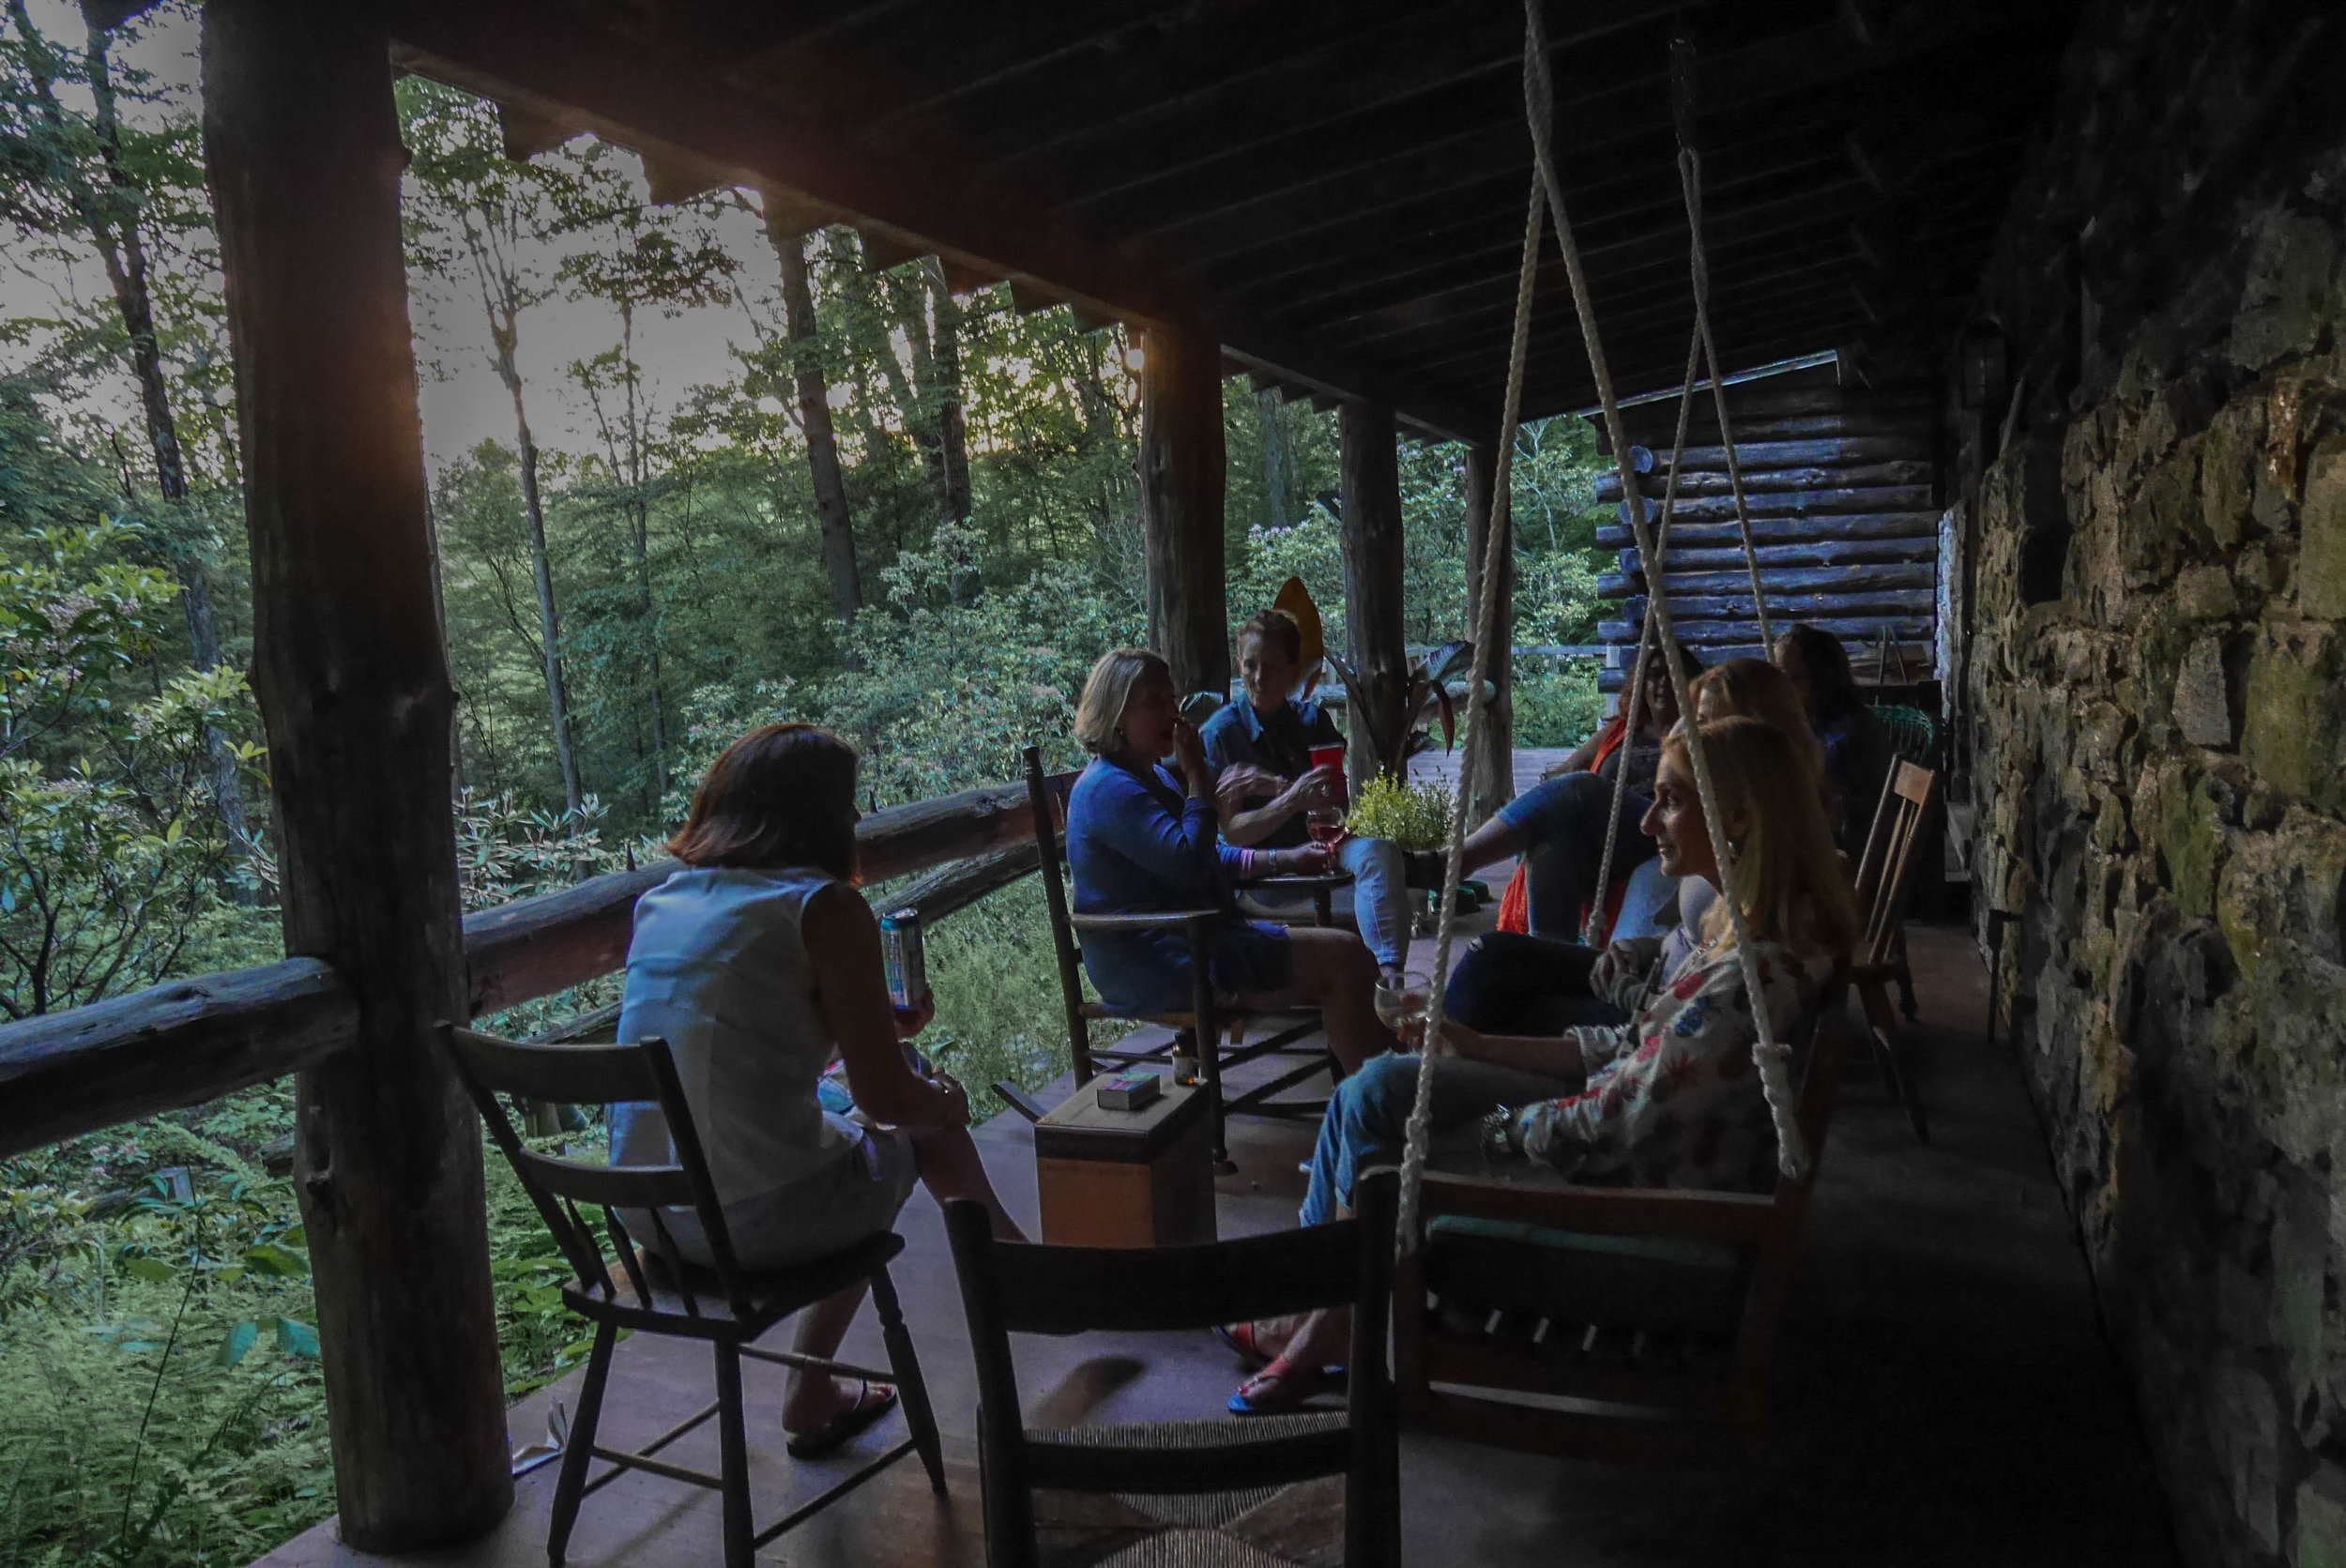 The Cabin - Colebrook, CT